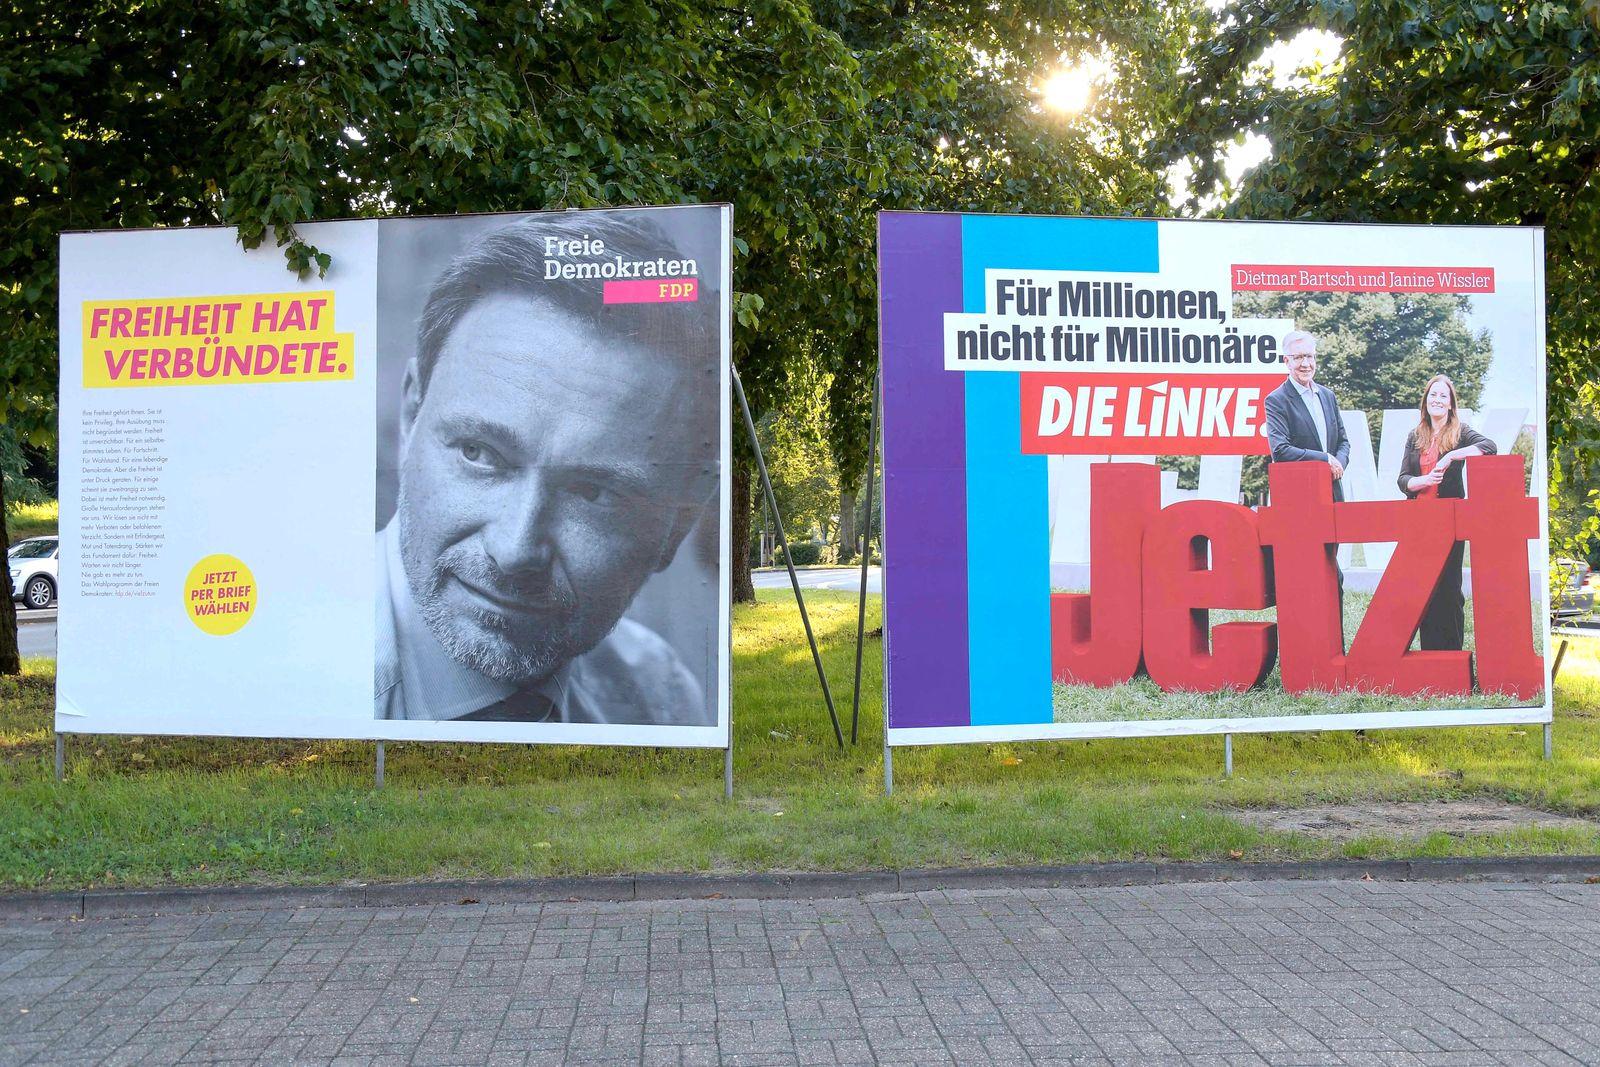 Wahlplakate - Bundestagswahl 2021 am 31.08.2021 in Oberhausen Wahlplakat der FDP ( Freie Demokratische Partei ) mit der